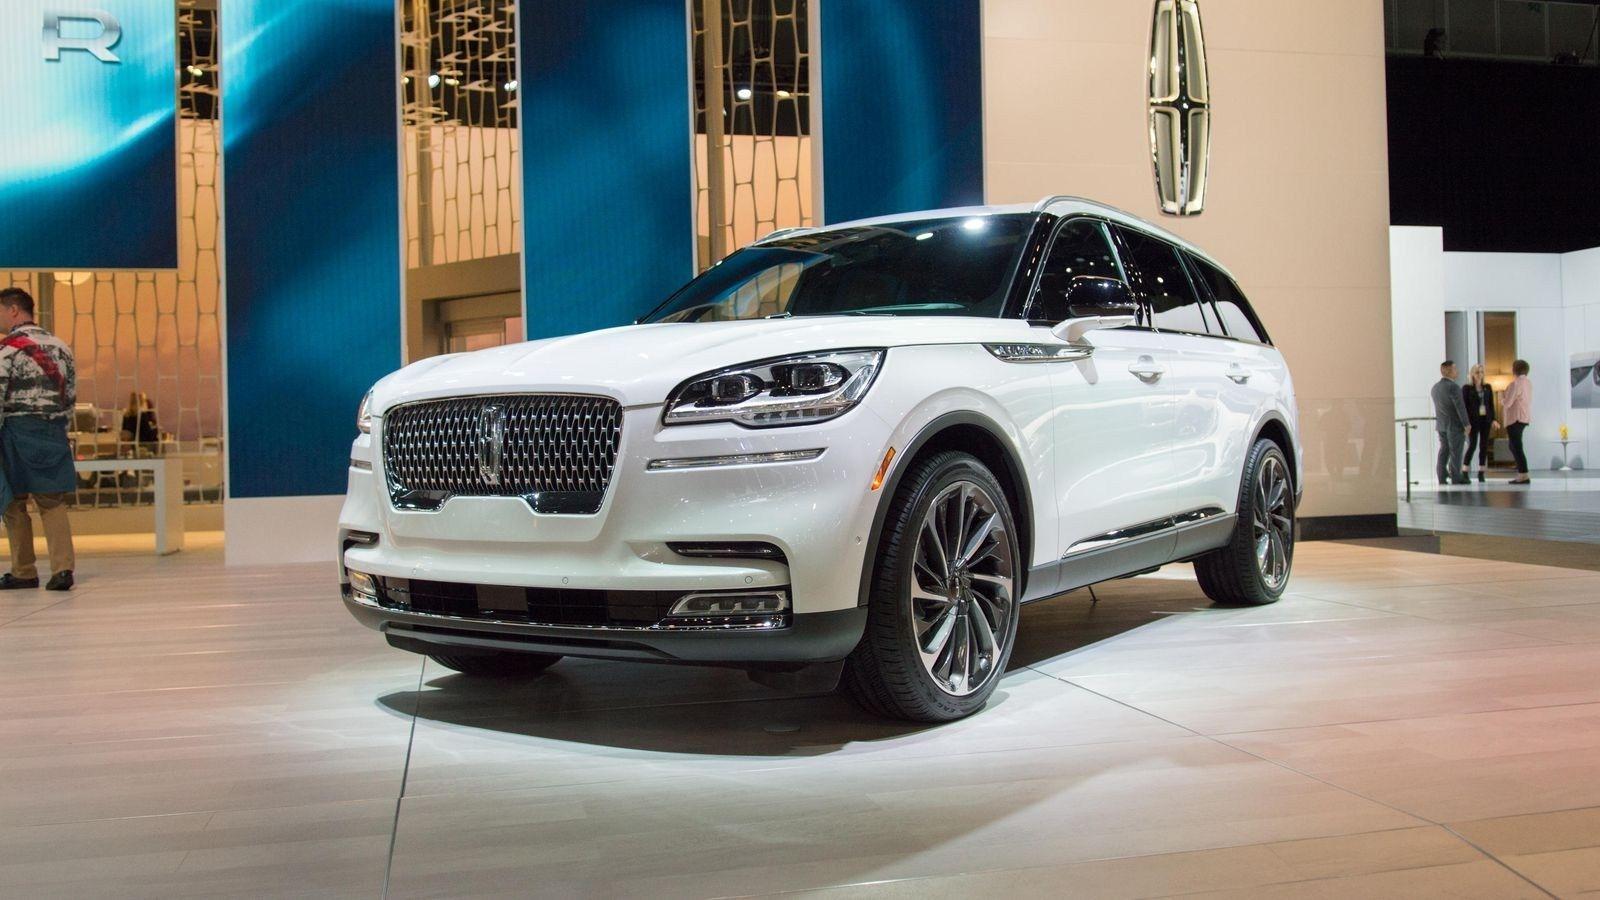 2020 Lincoln Aviator Vs Volvo Xc90 Features Lincoln